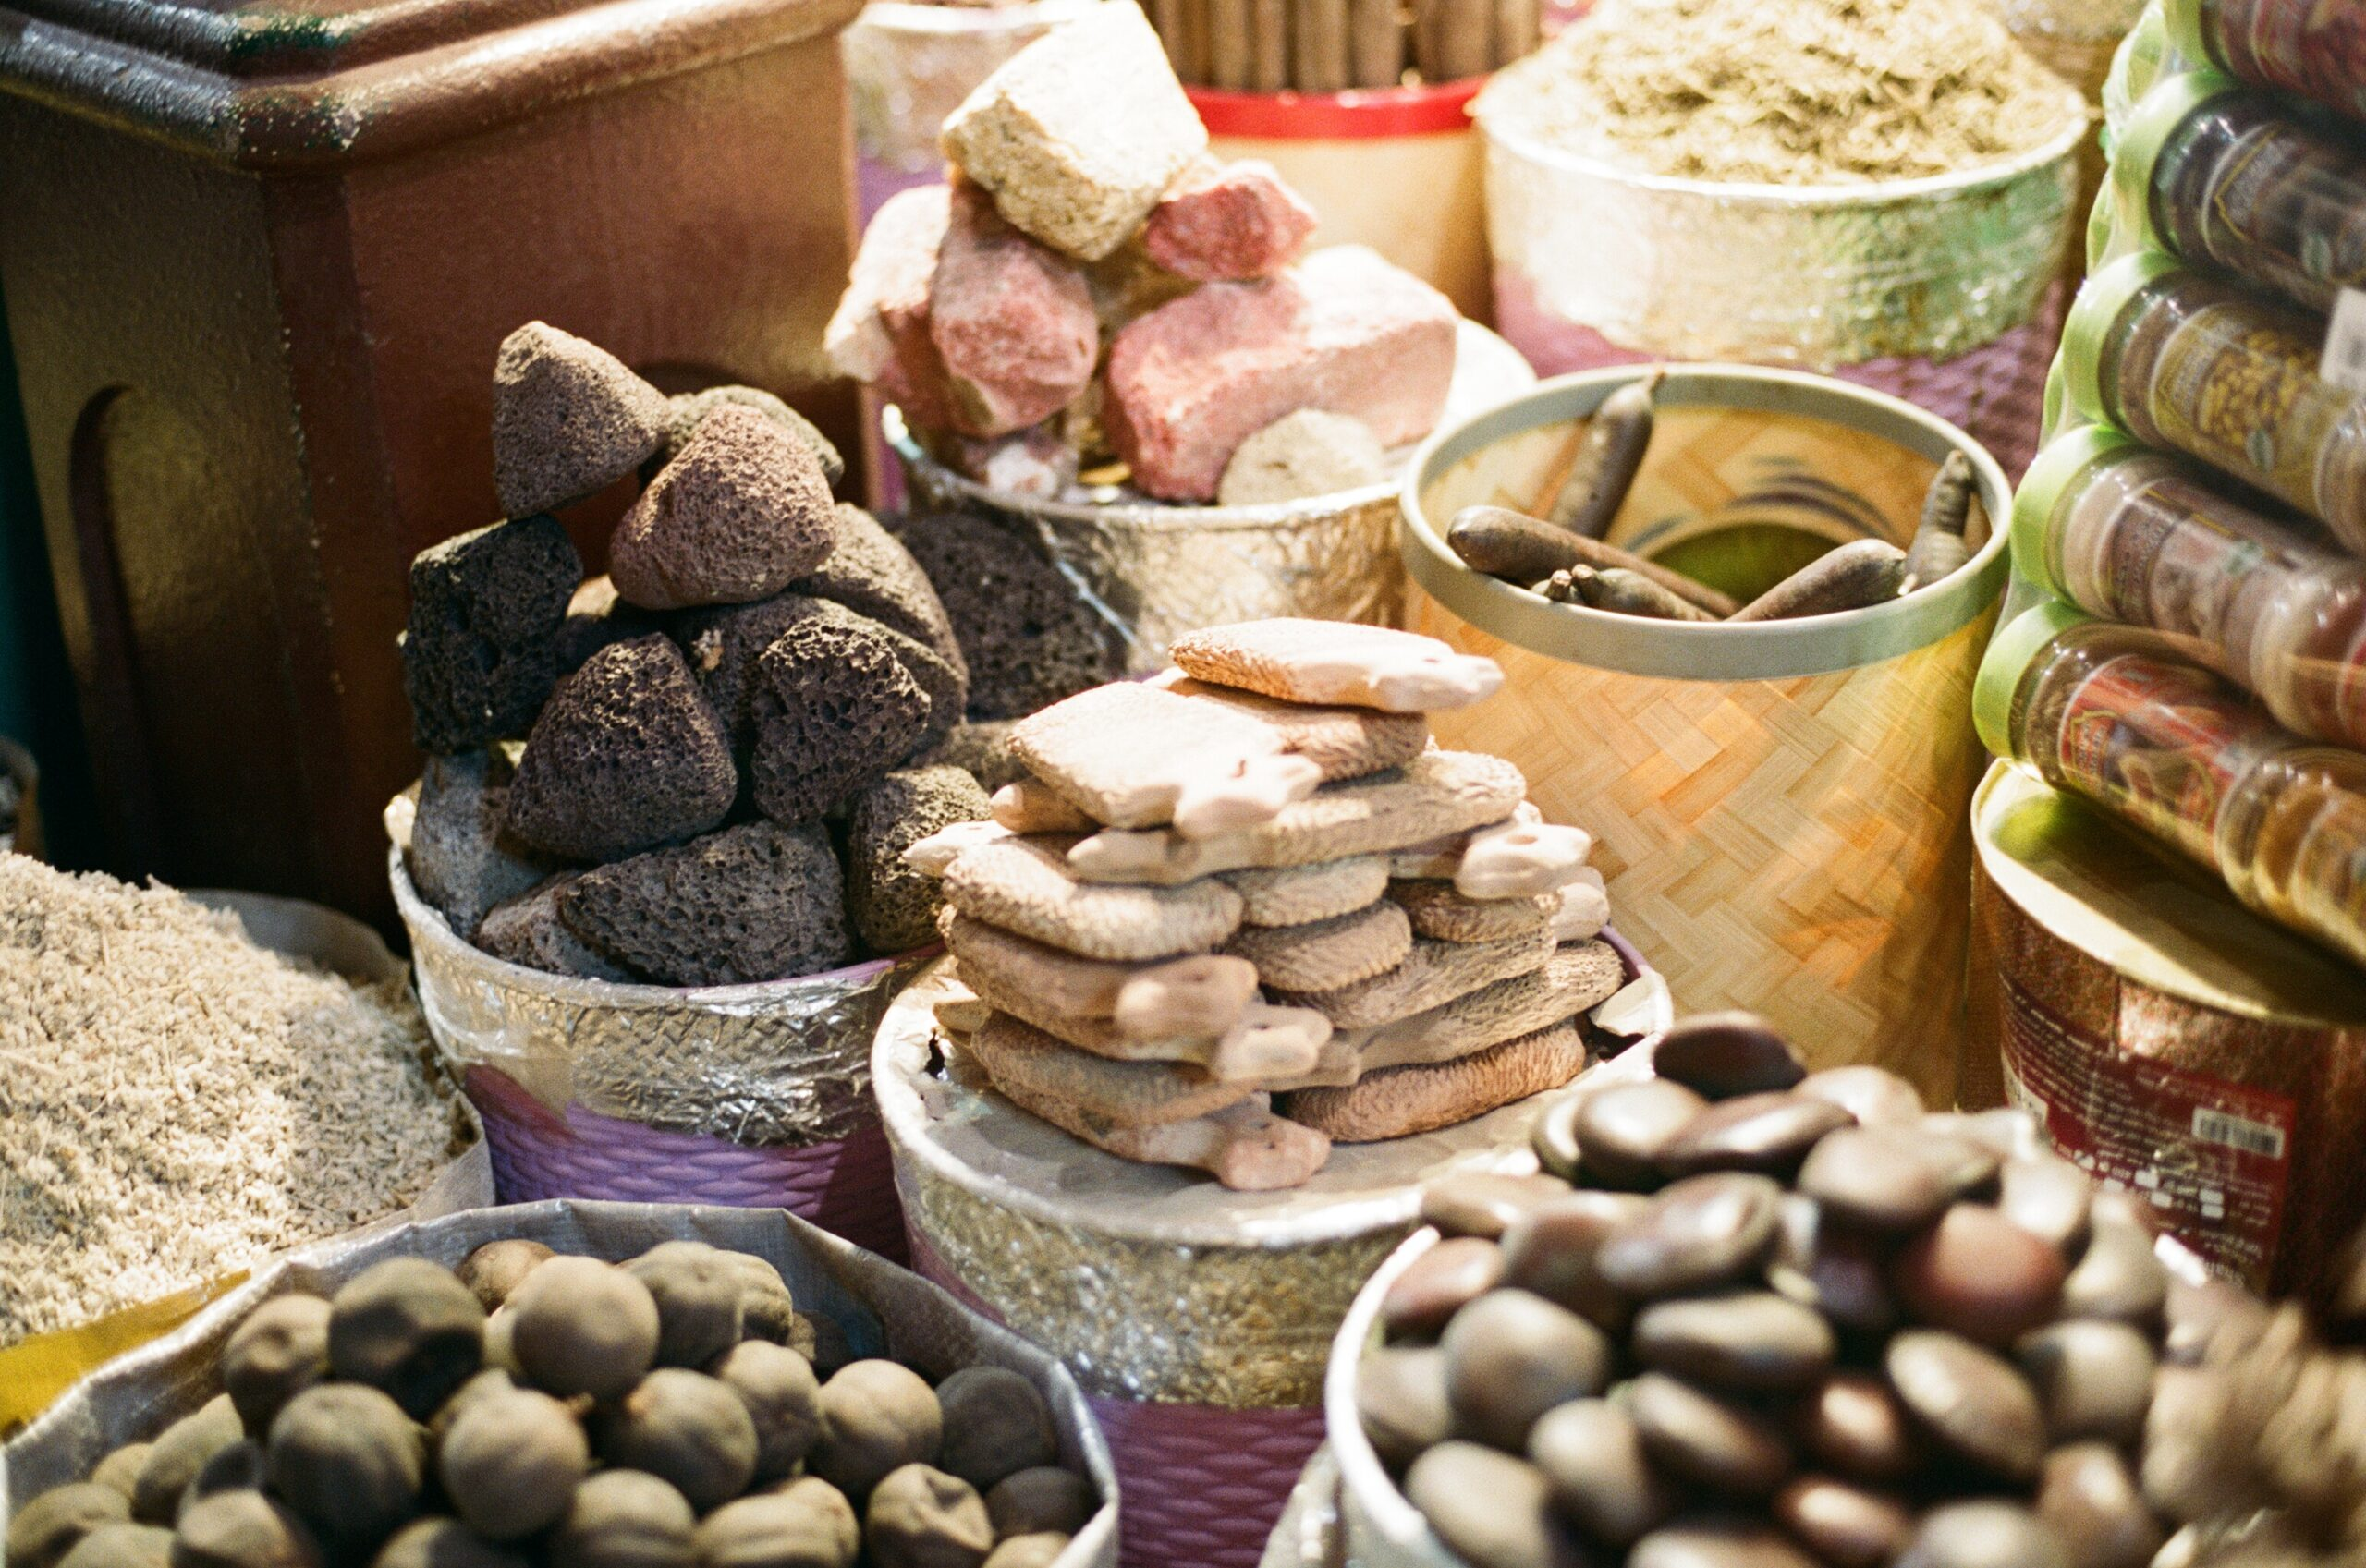 Herbs at the souk of Dubai